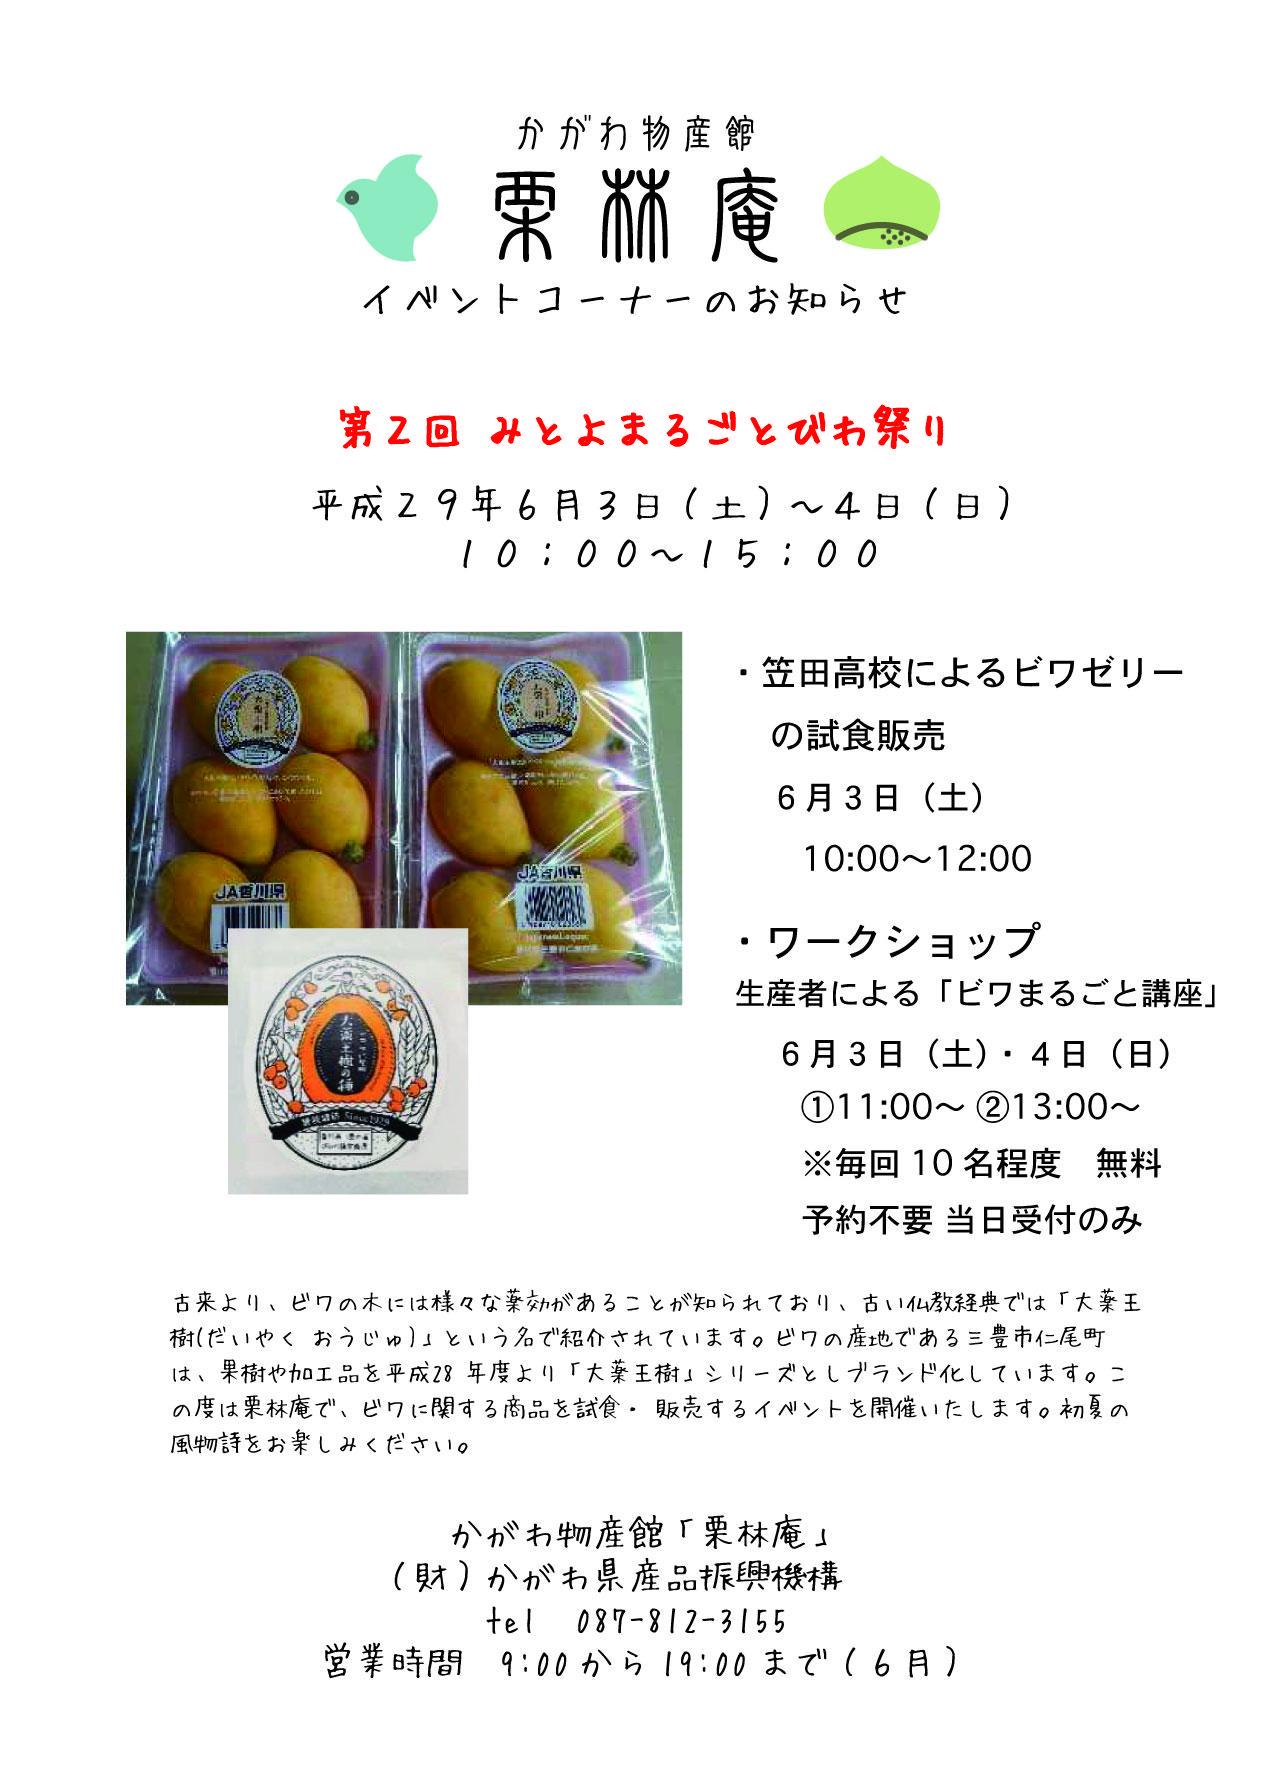 http://www.ritsurinan.jp/news/2bd91586139973c1dd086cf694be32e5890c57bd.jpg